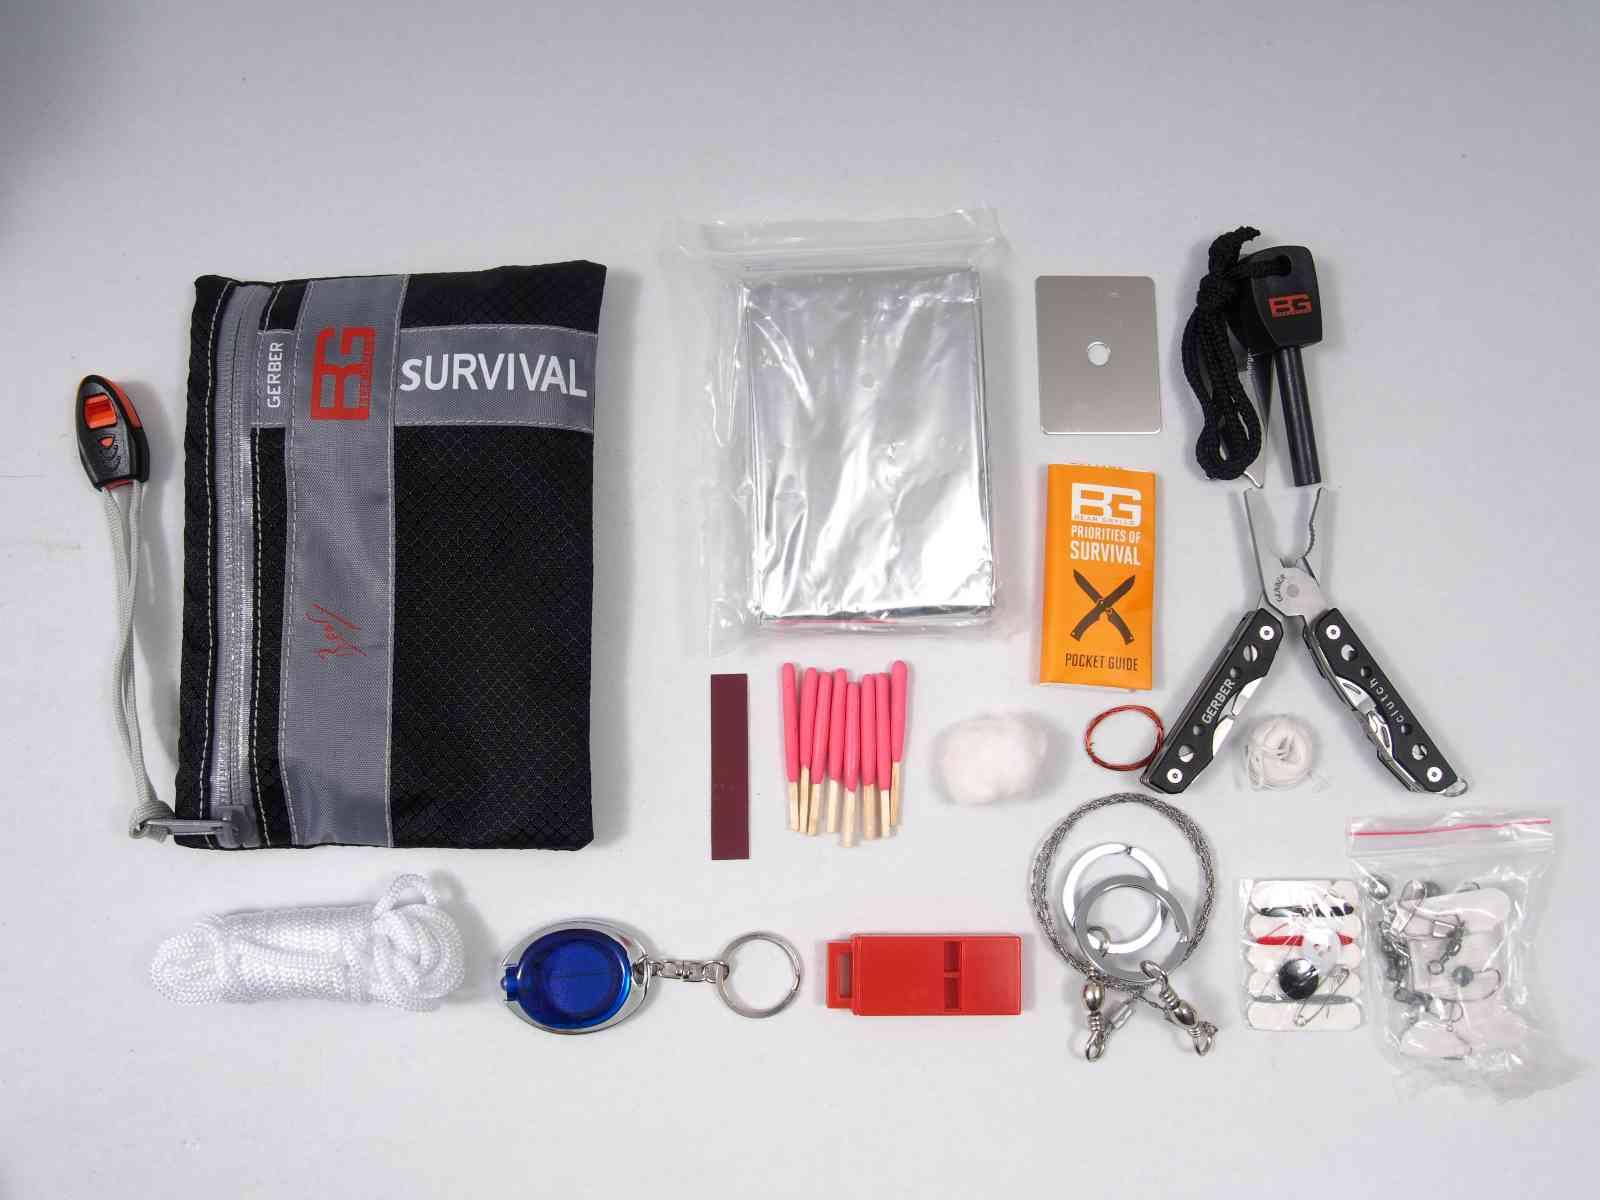 Gerber Bear Grylls Ultimate Survival Kit - Inhalt